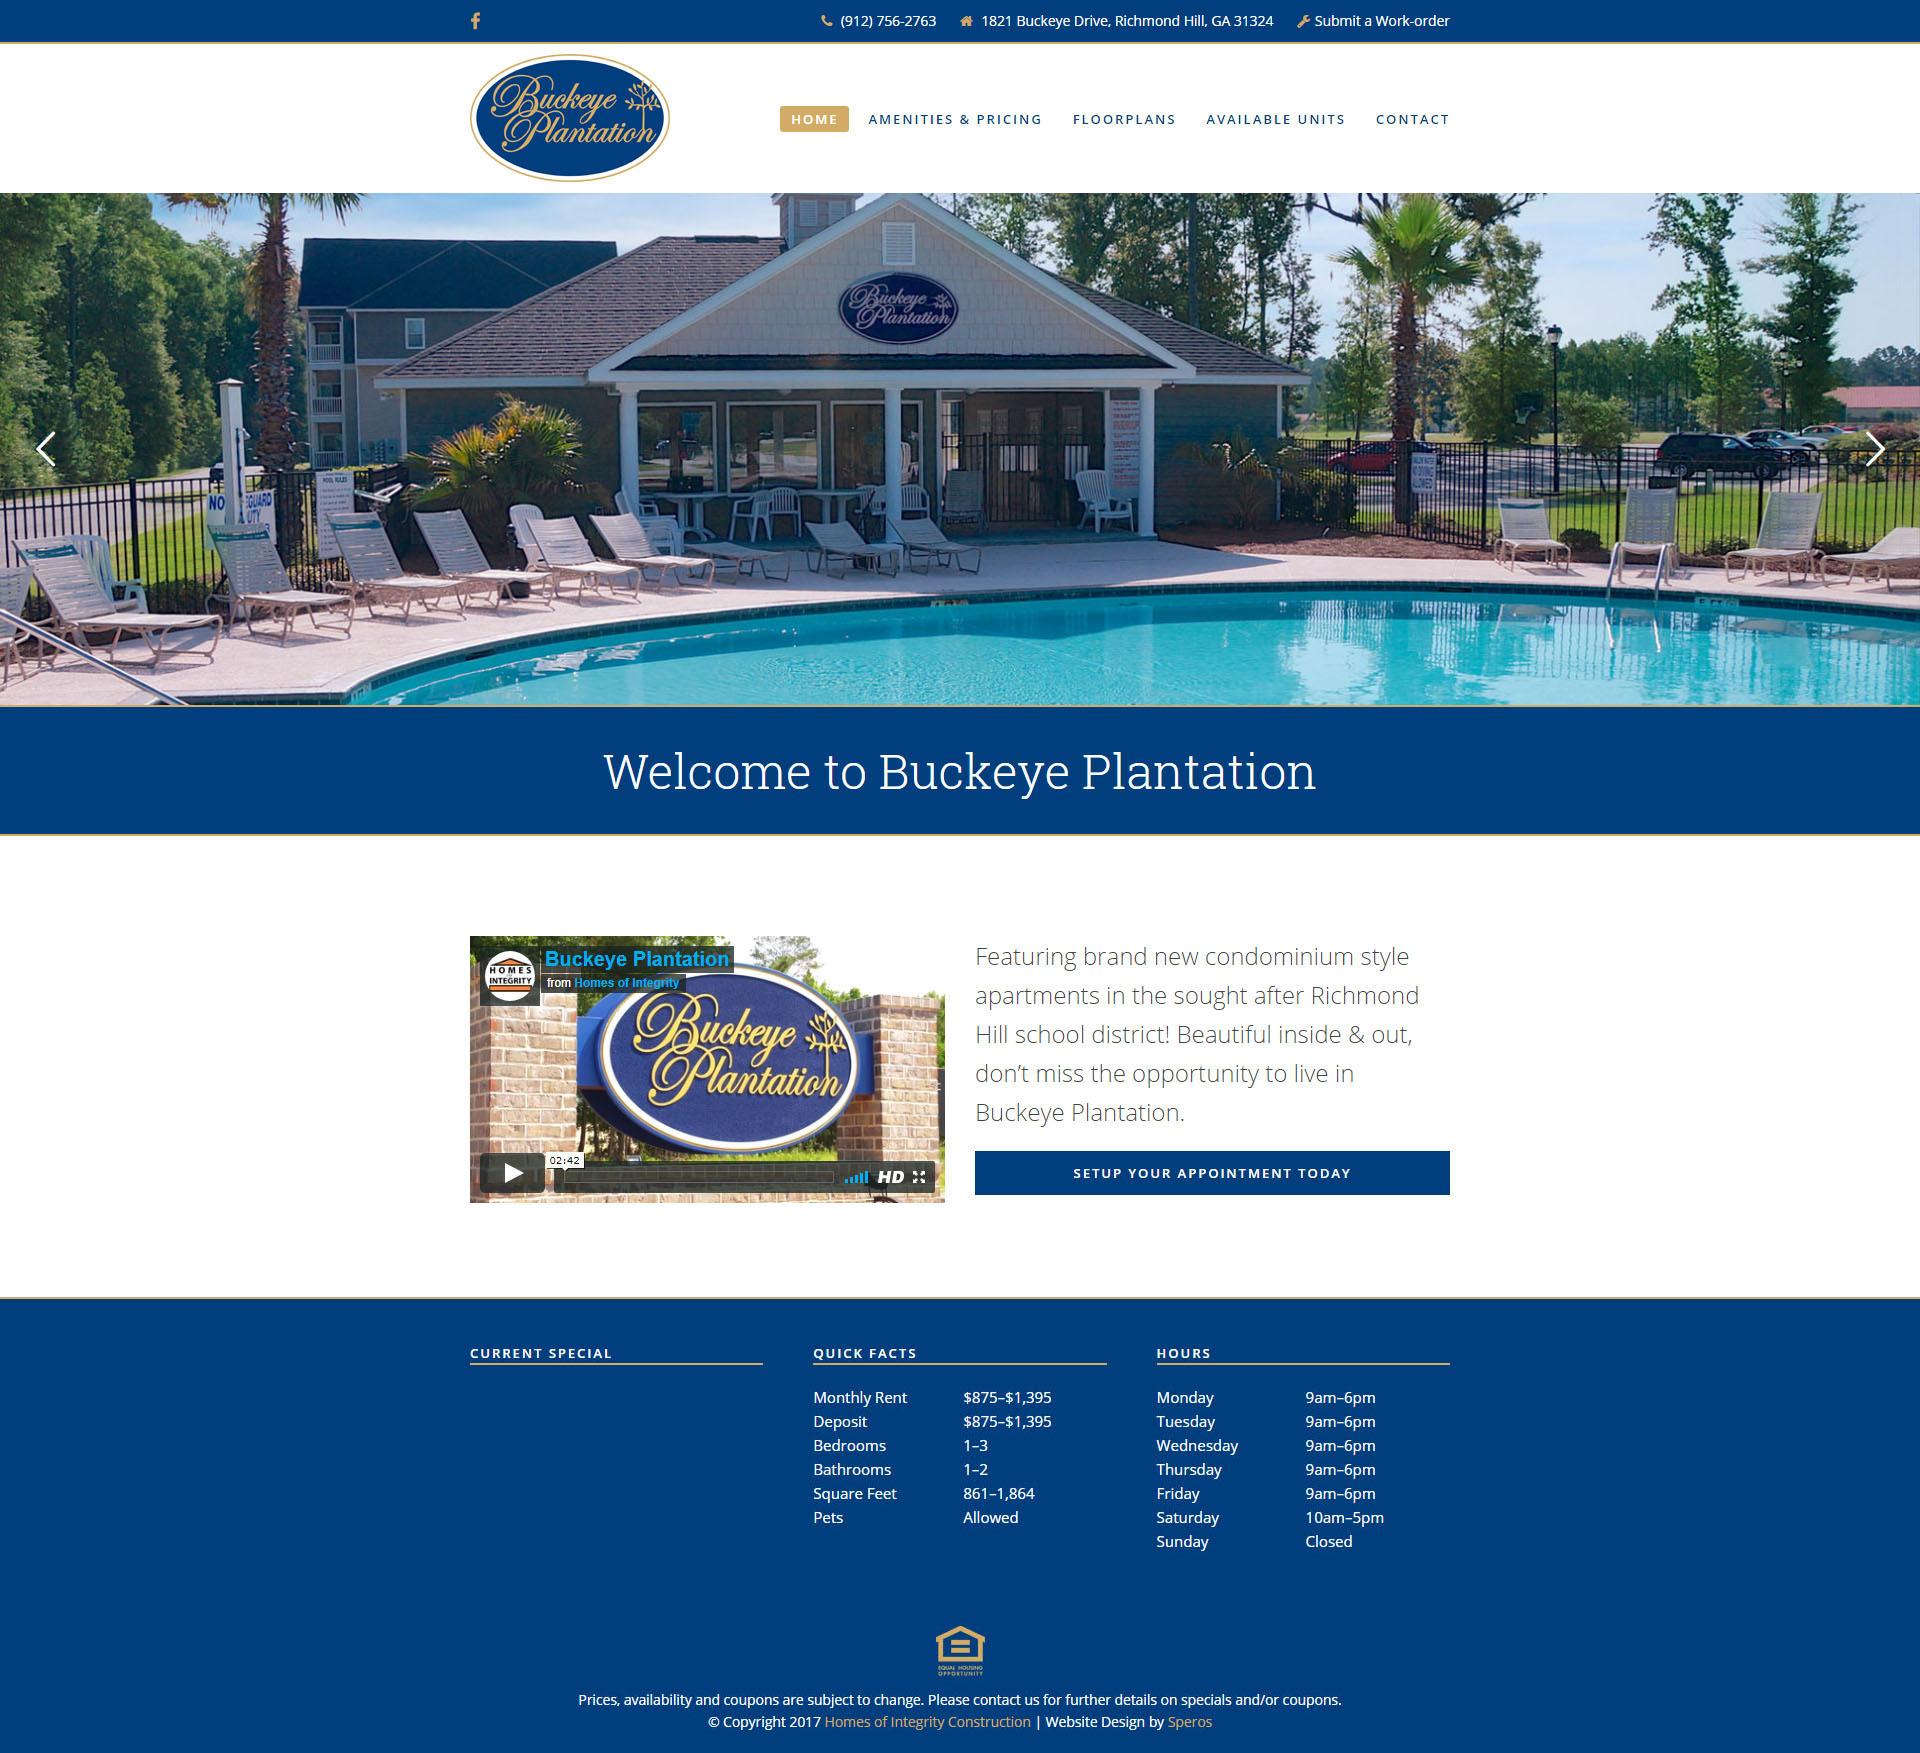 Buckeye Plantation Website Design